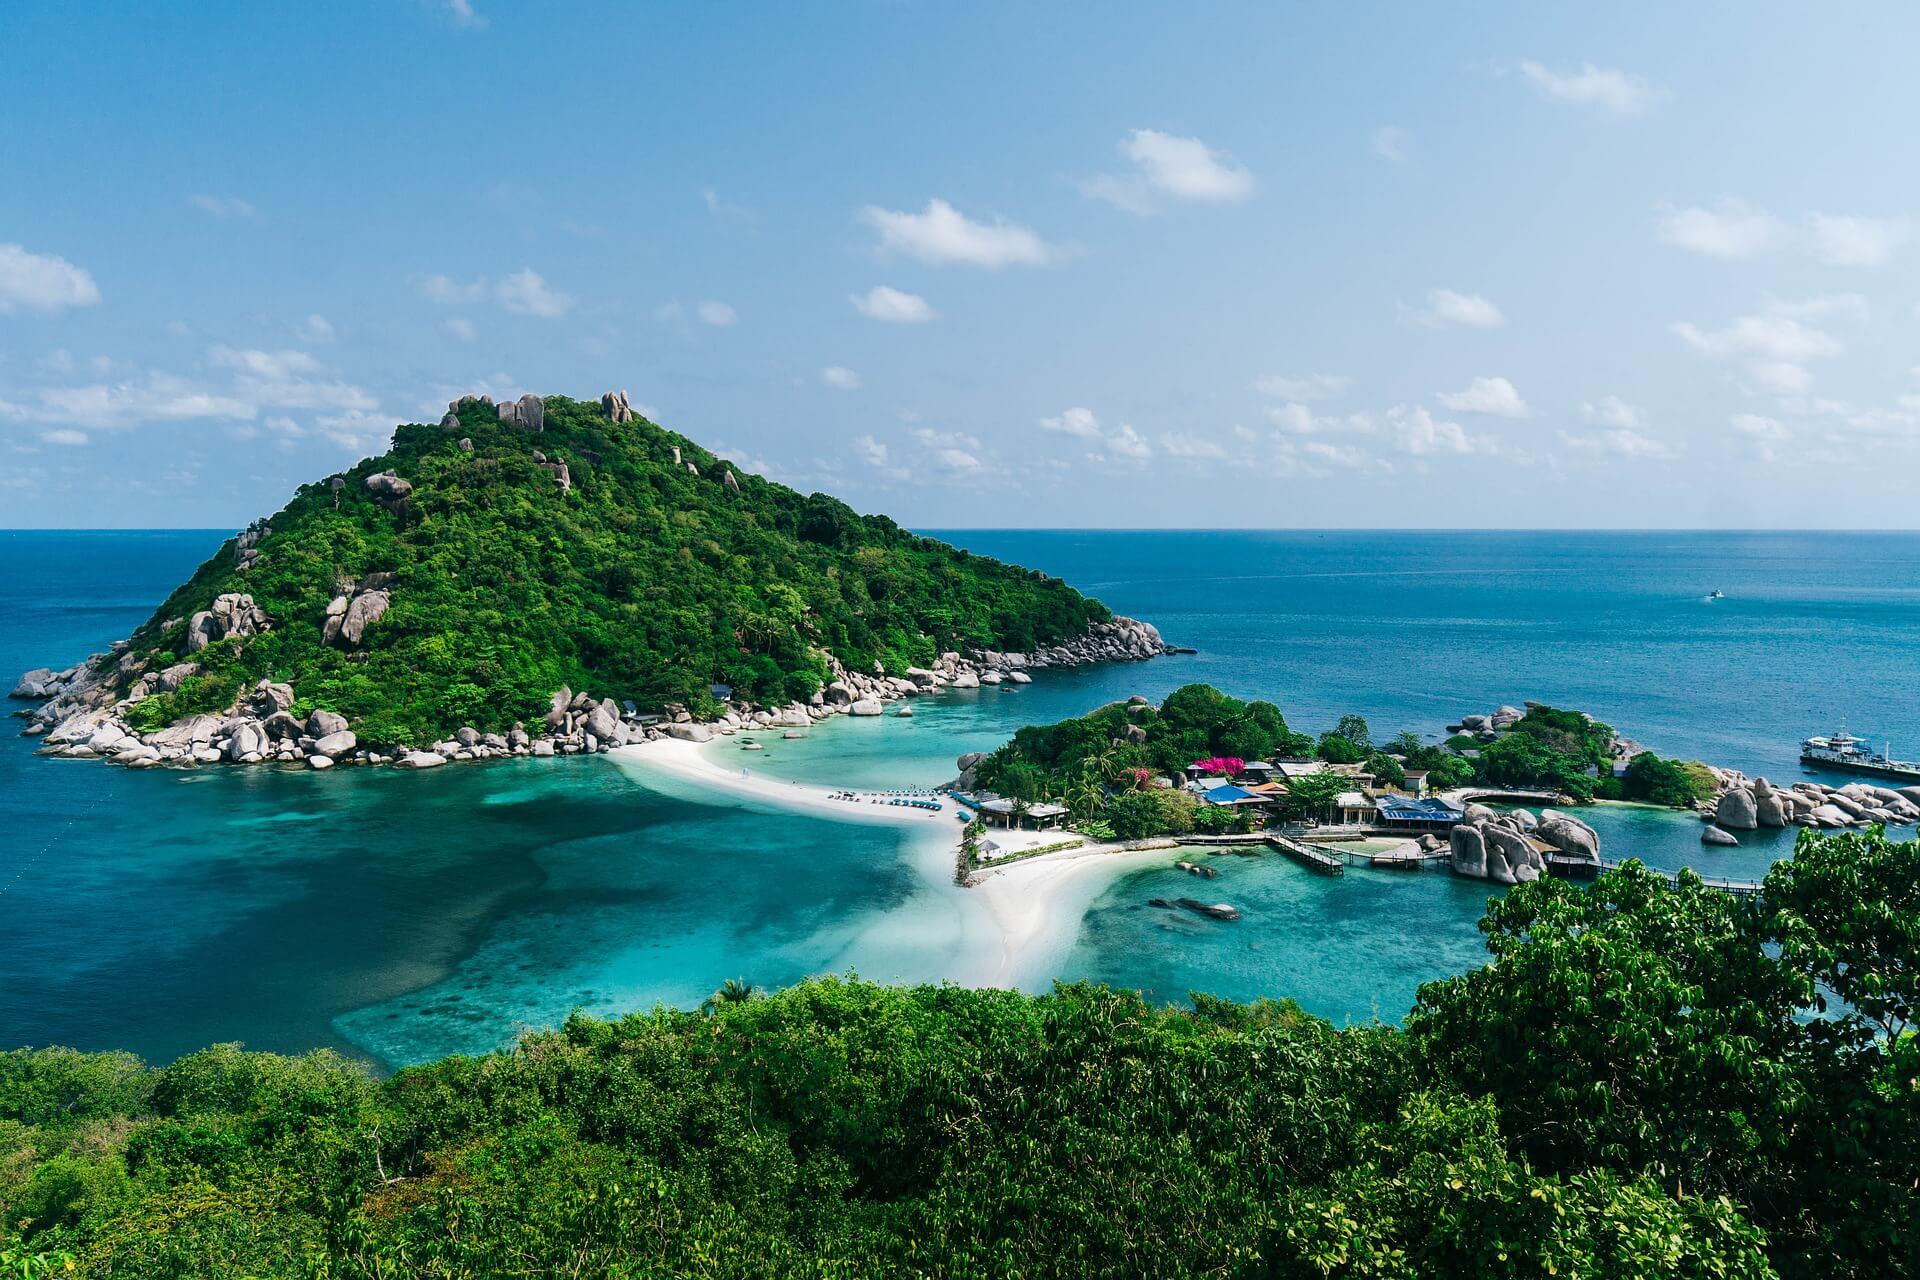 Nang Yuan Lookout Point